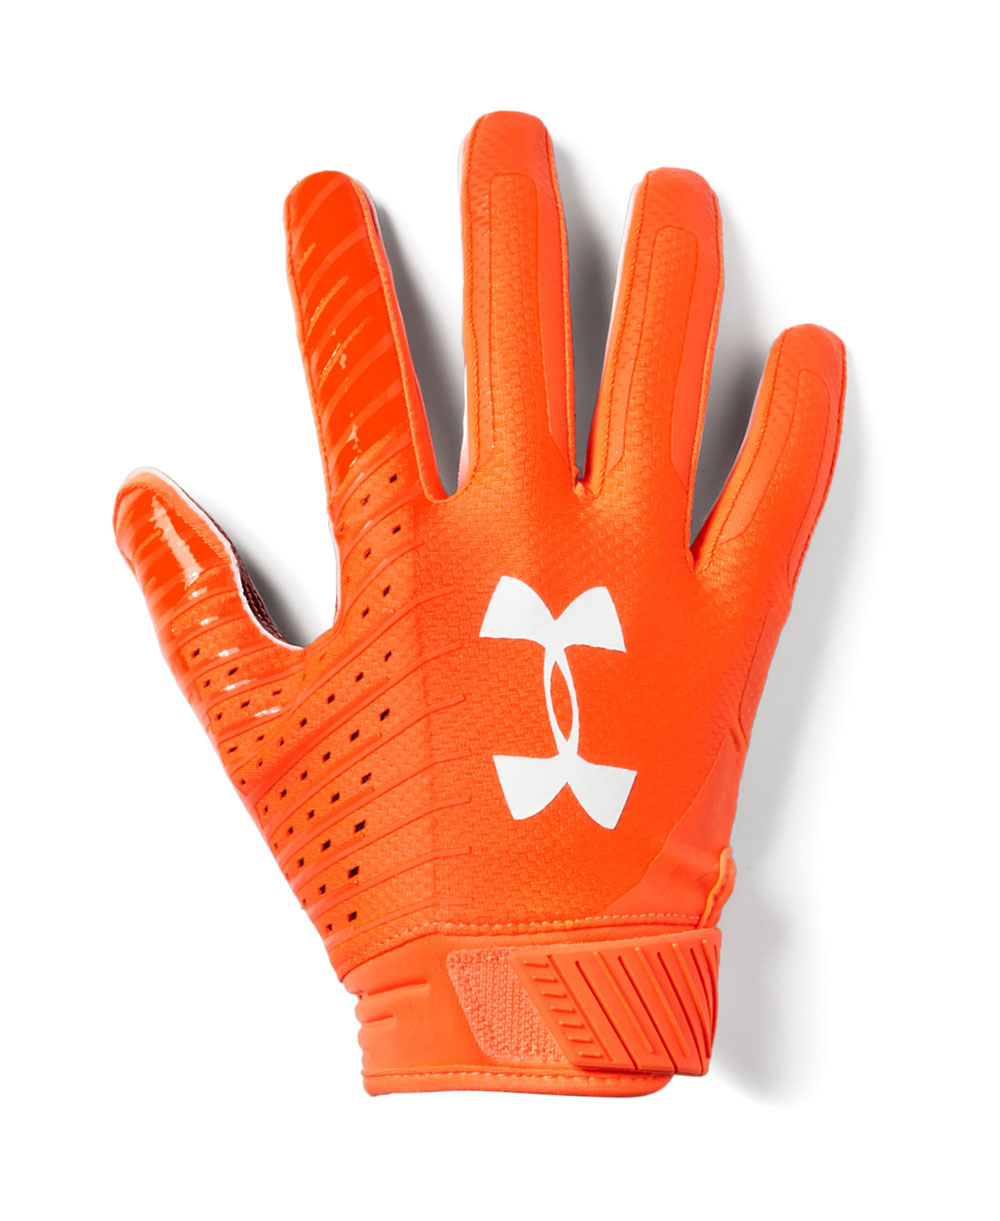 Spotlight LE Herren American Football Handschuhe Orange Glitch